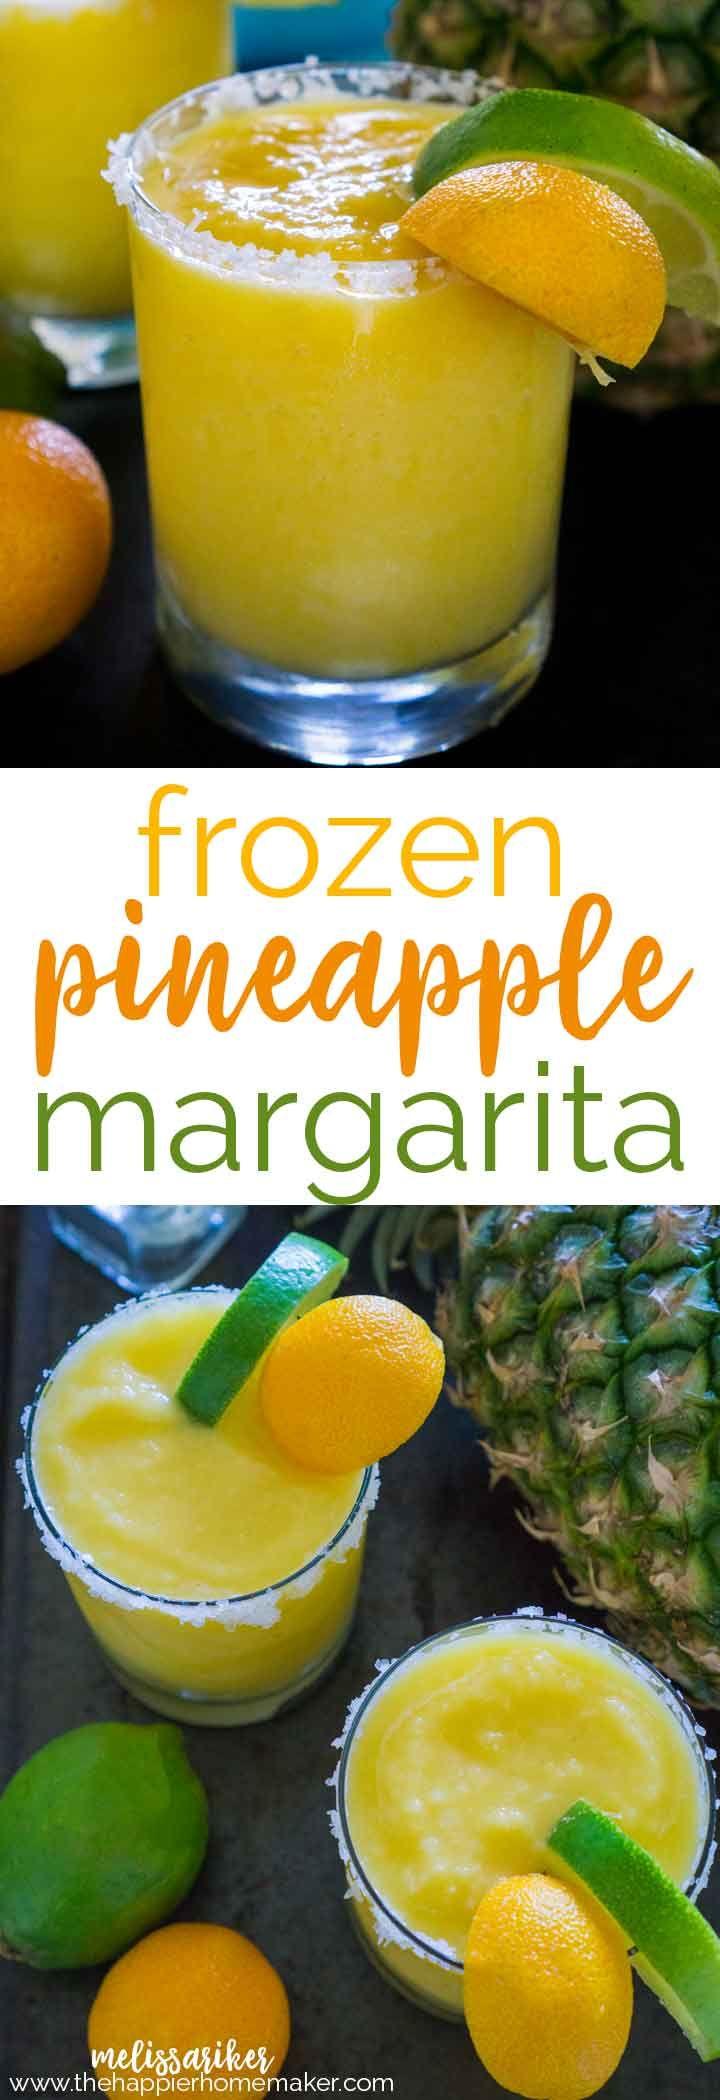 Frozen Pineapple Margarita #frozenmargaritarecipes